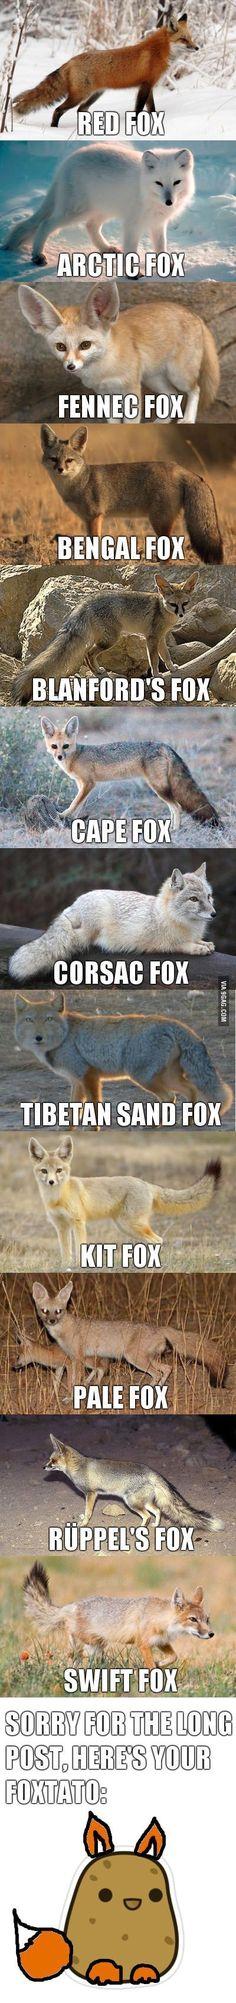 Nature Animals Fennec Fox Ideas For 2019 Cute Funny Animals, Cute Baby Animals, Funny Cute, Nature Animals, Animals And Pets, Strange Animals, Fennec Fox, Animal Memes, Animal Kingdom